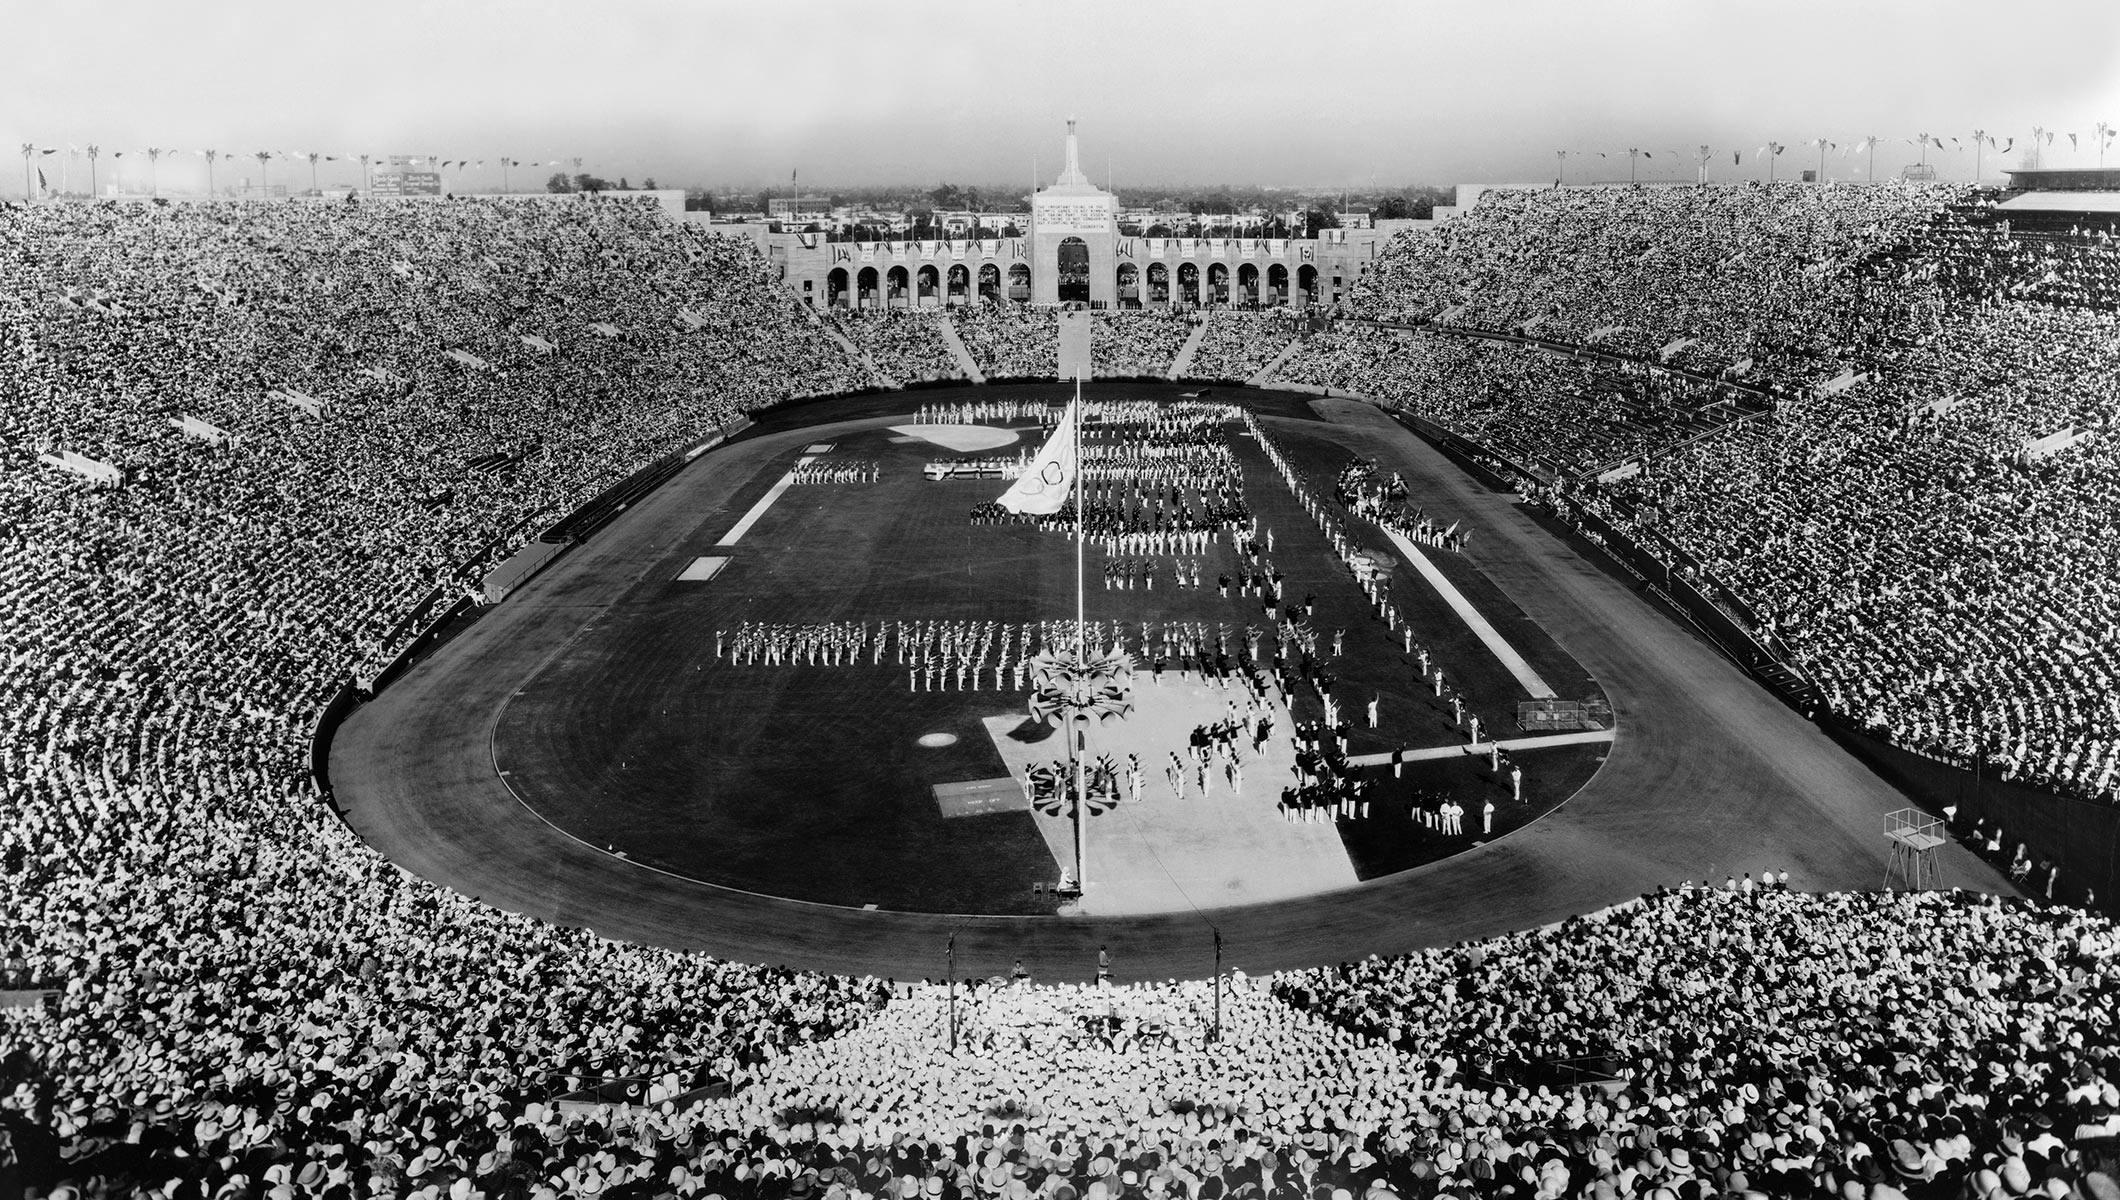 LA Coliseum 1932 Summer Olympics Opening Ceremony